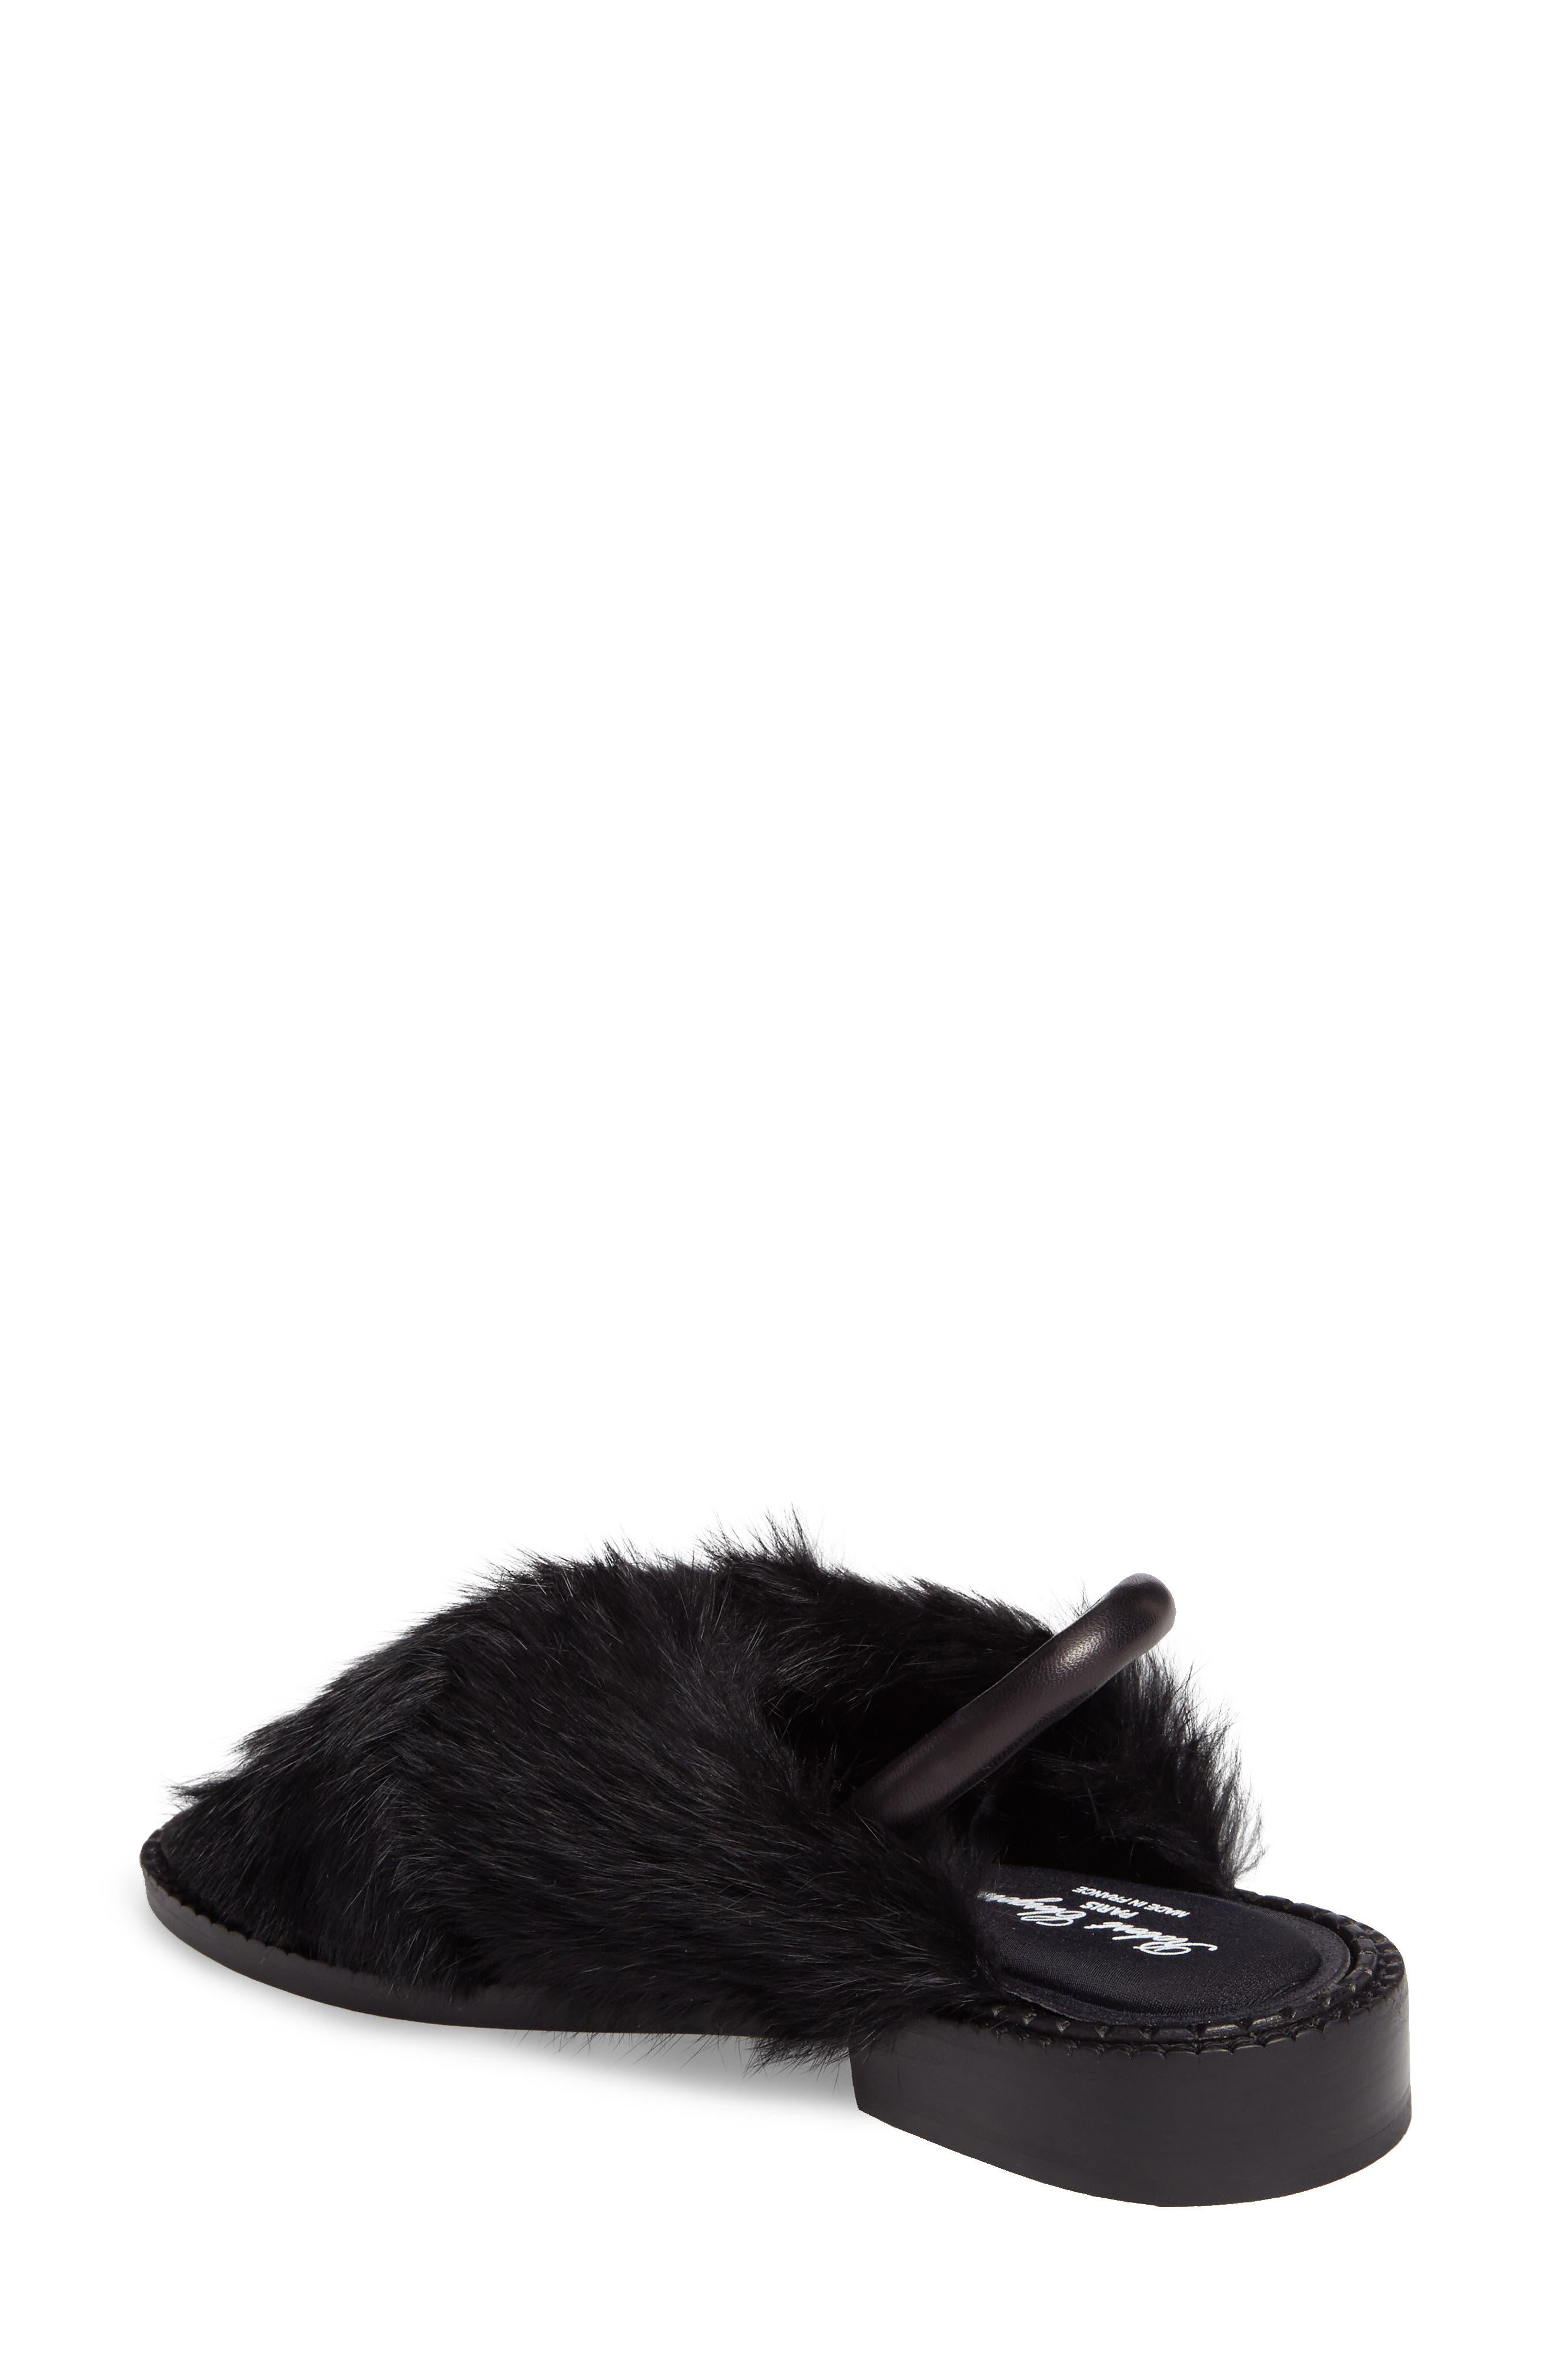 Alternate Image 2  - Robert Clergerie Bloss Genuine Fur Sandal (Women)